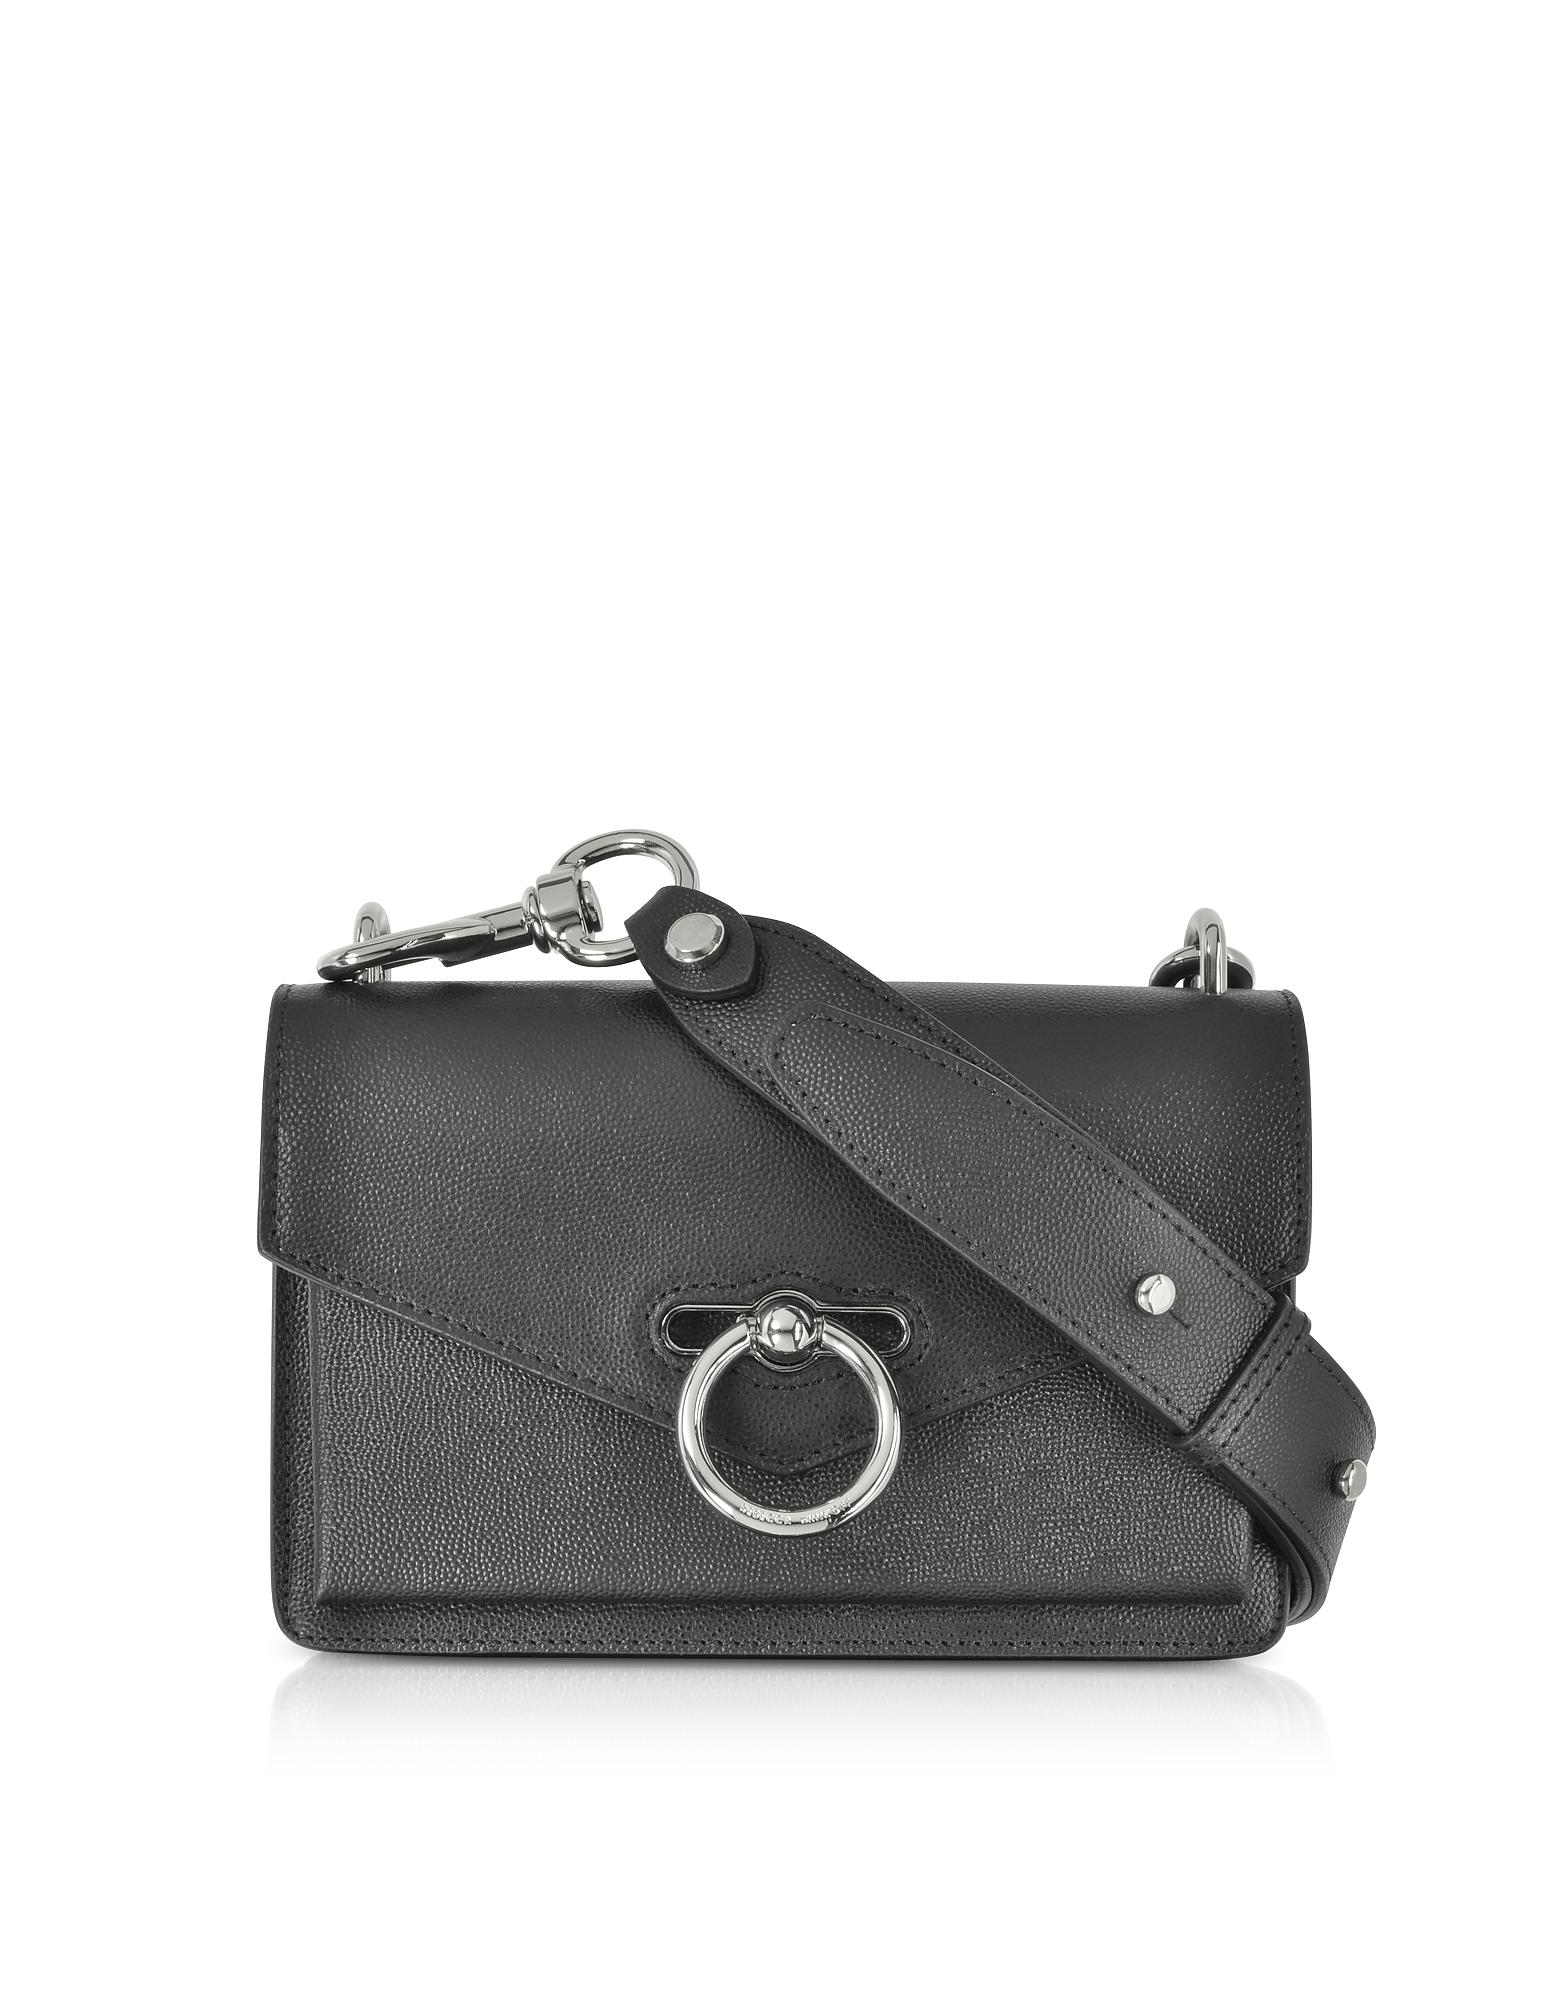 Rebecca Minkoff Handbags, Black Caviar Leather Jean Xbody Bag